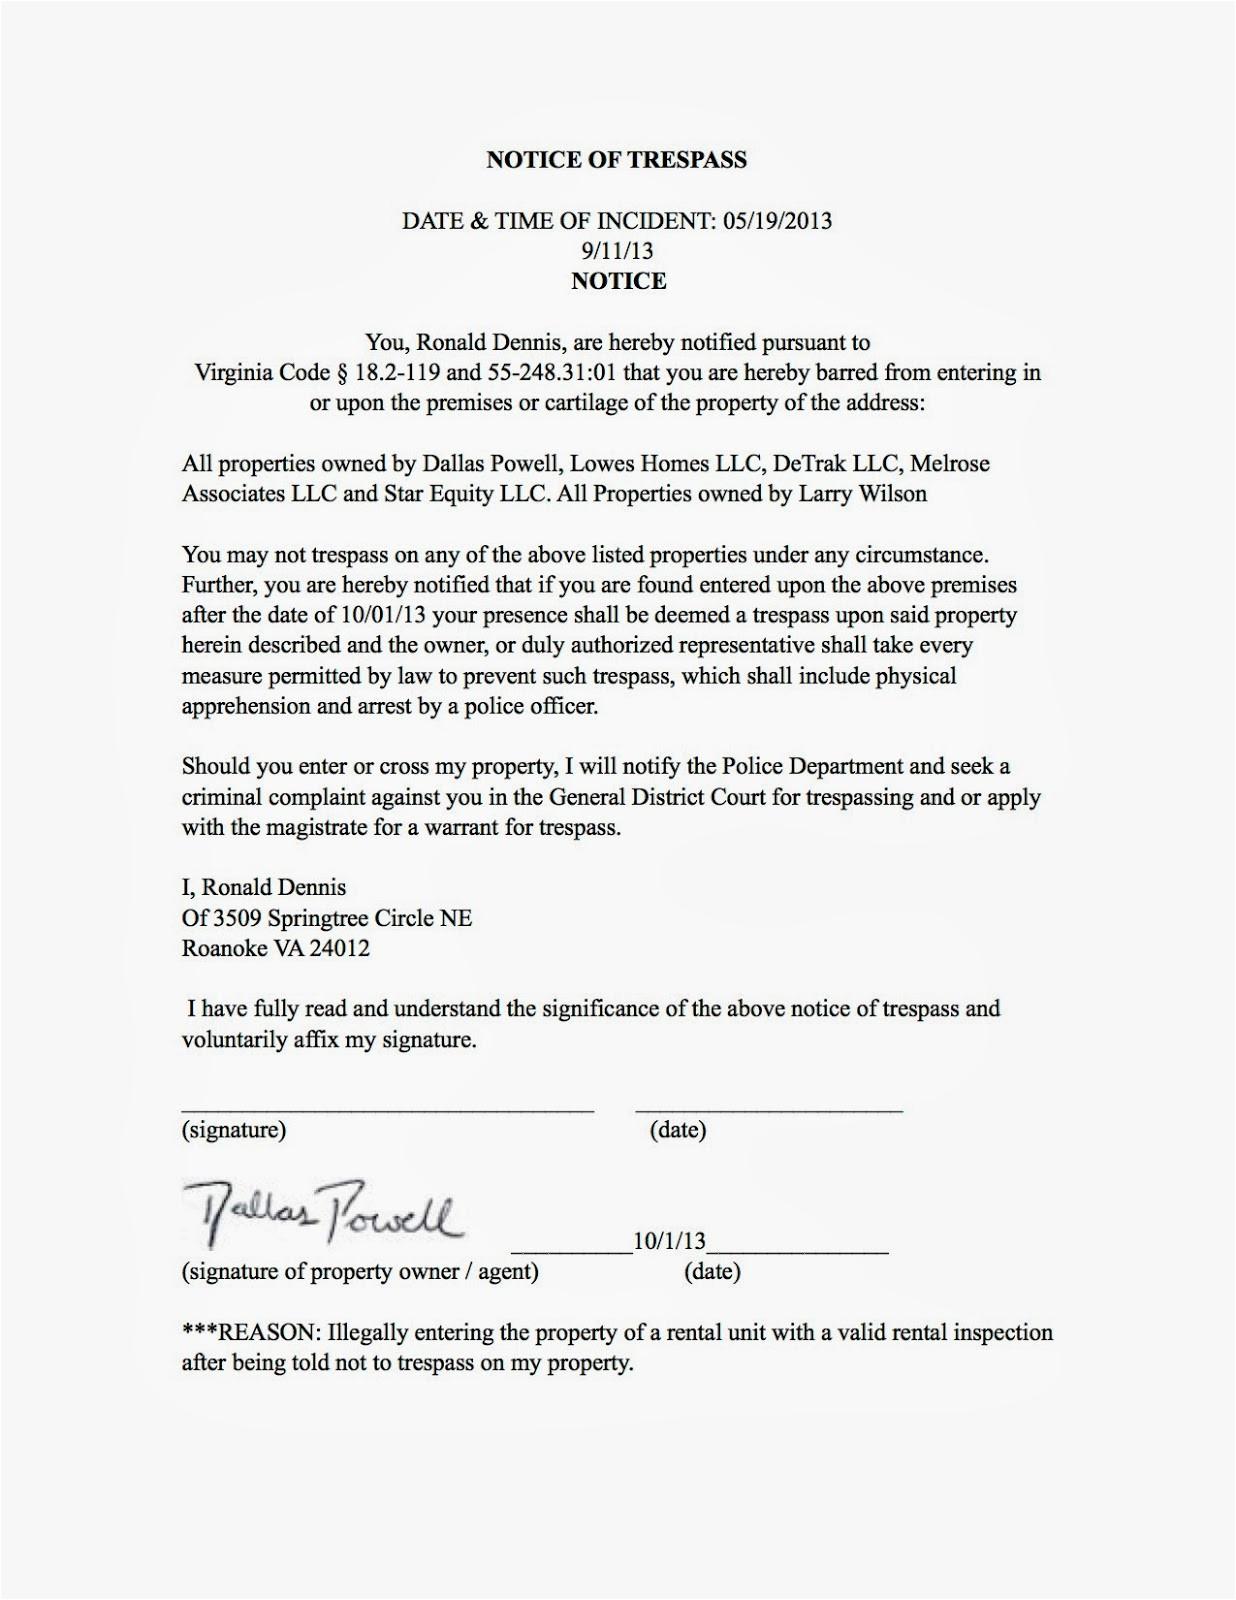 Trespass Notice Template Real Estate Investors Of Virginia Ronald Dennis Notice